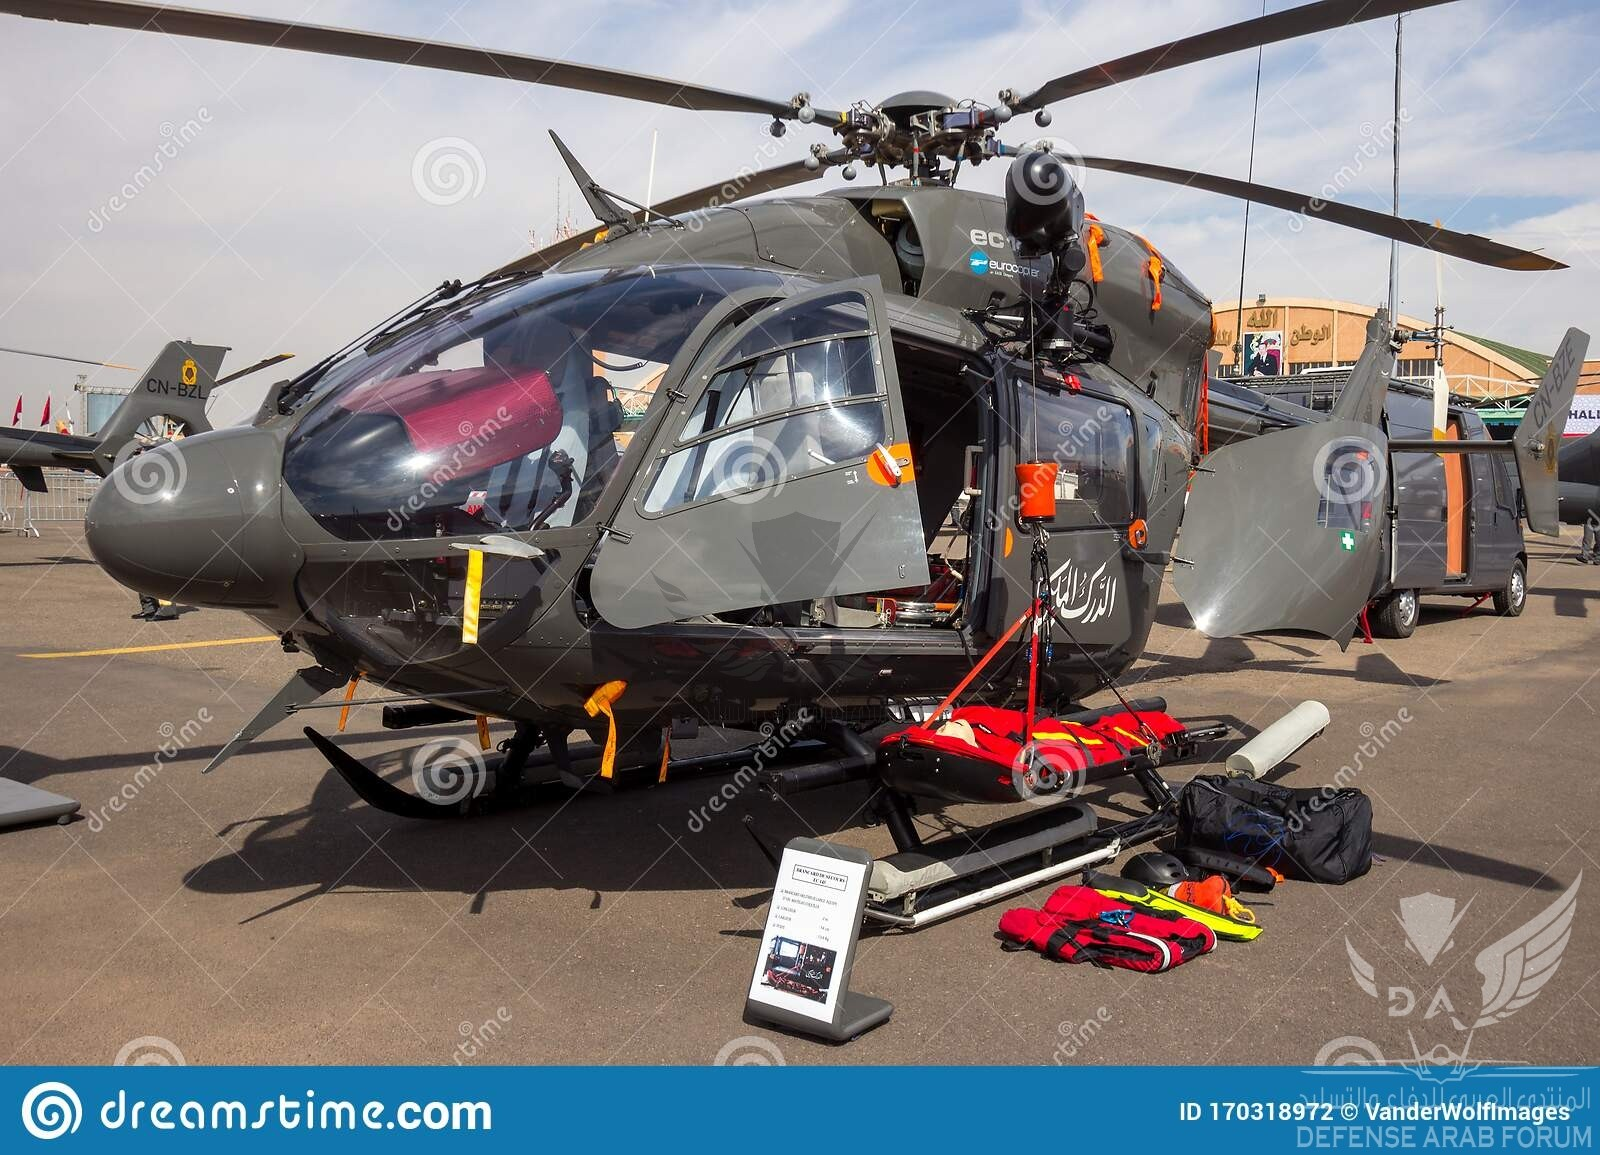 marrakech-morocco-apr-royal-moroccan-gendarmerie-military-police-eurocopter-ec-helicopter-disp...jpg